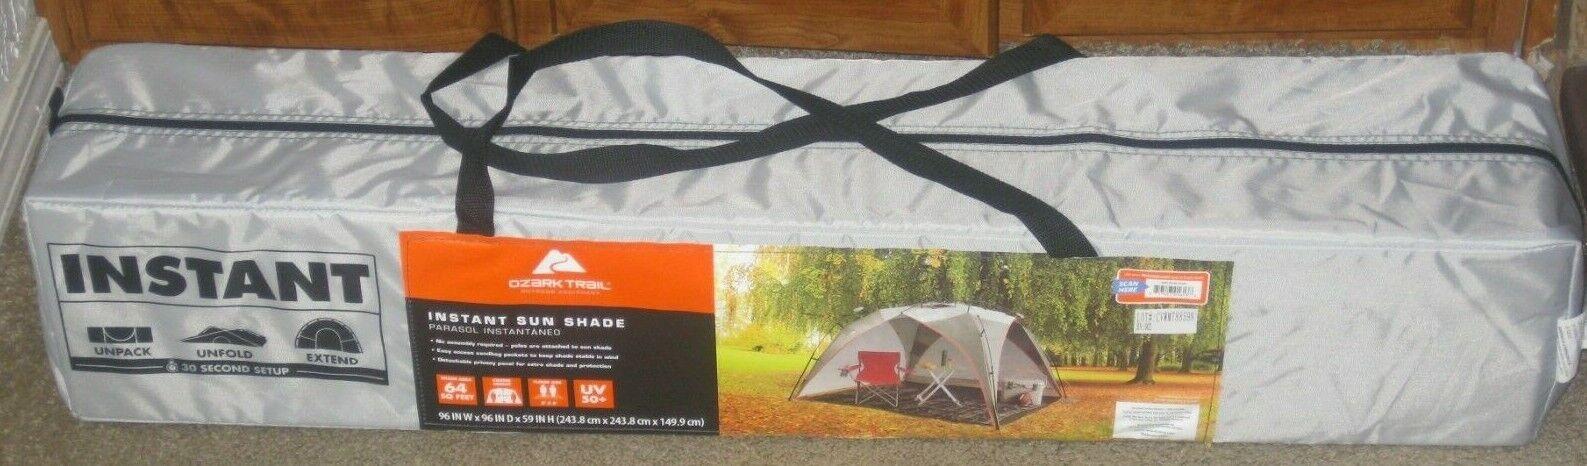 Ozark Trail 8' X 8' Instant  Parasol  nueva gama alta exclusiva